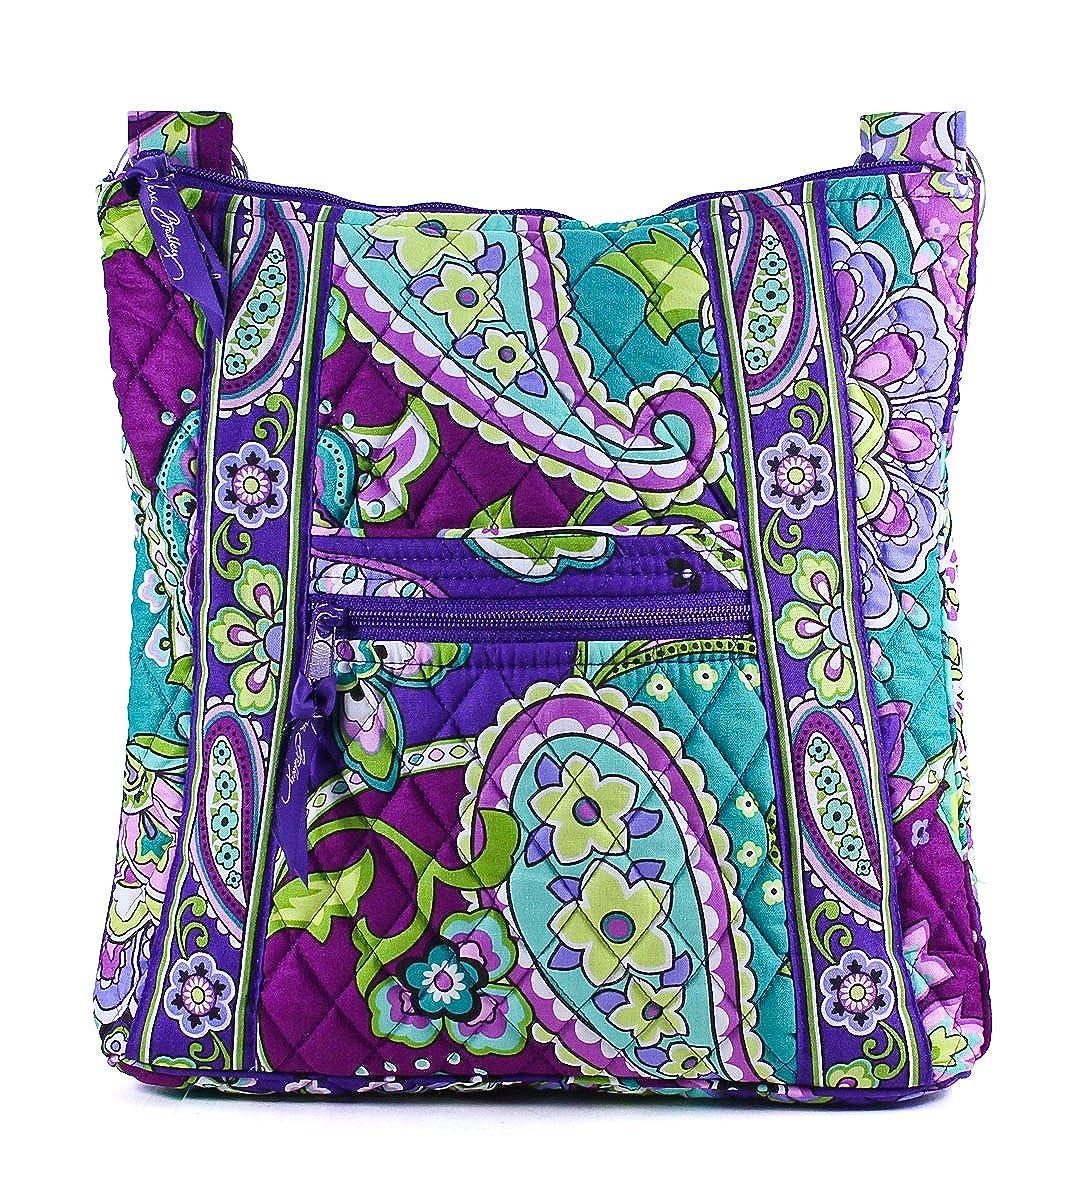 241593c150 Vera Bradley Hipster Cross Body Bag in Heather  Handbags  Amazon.com